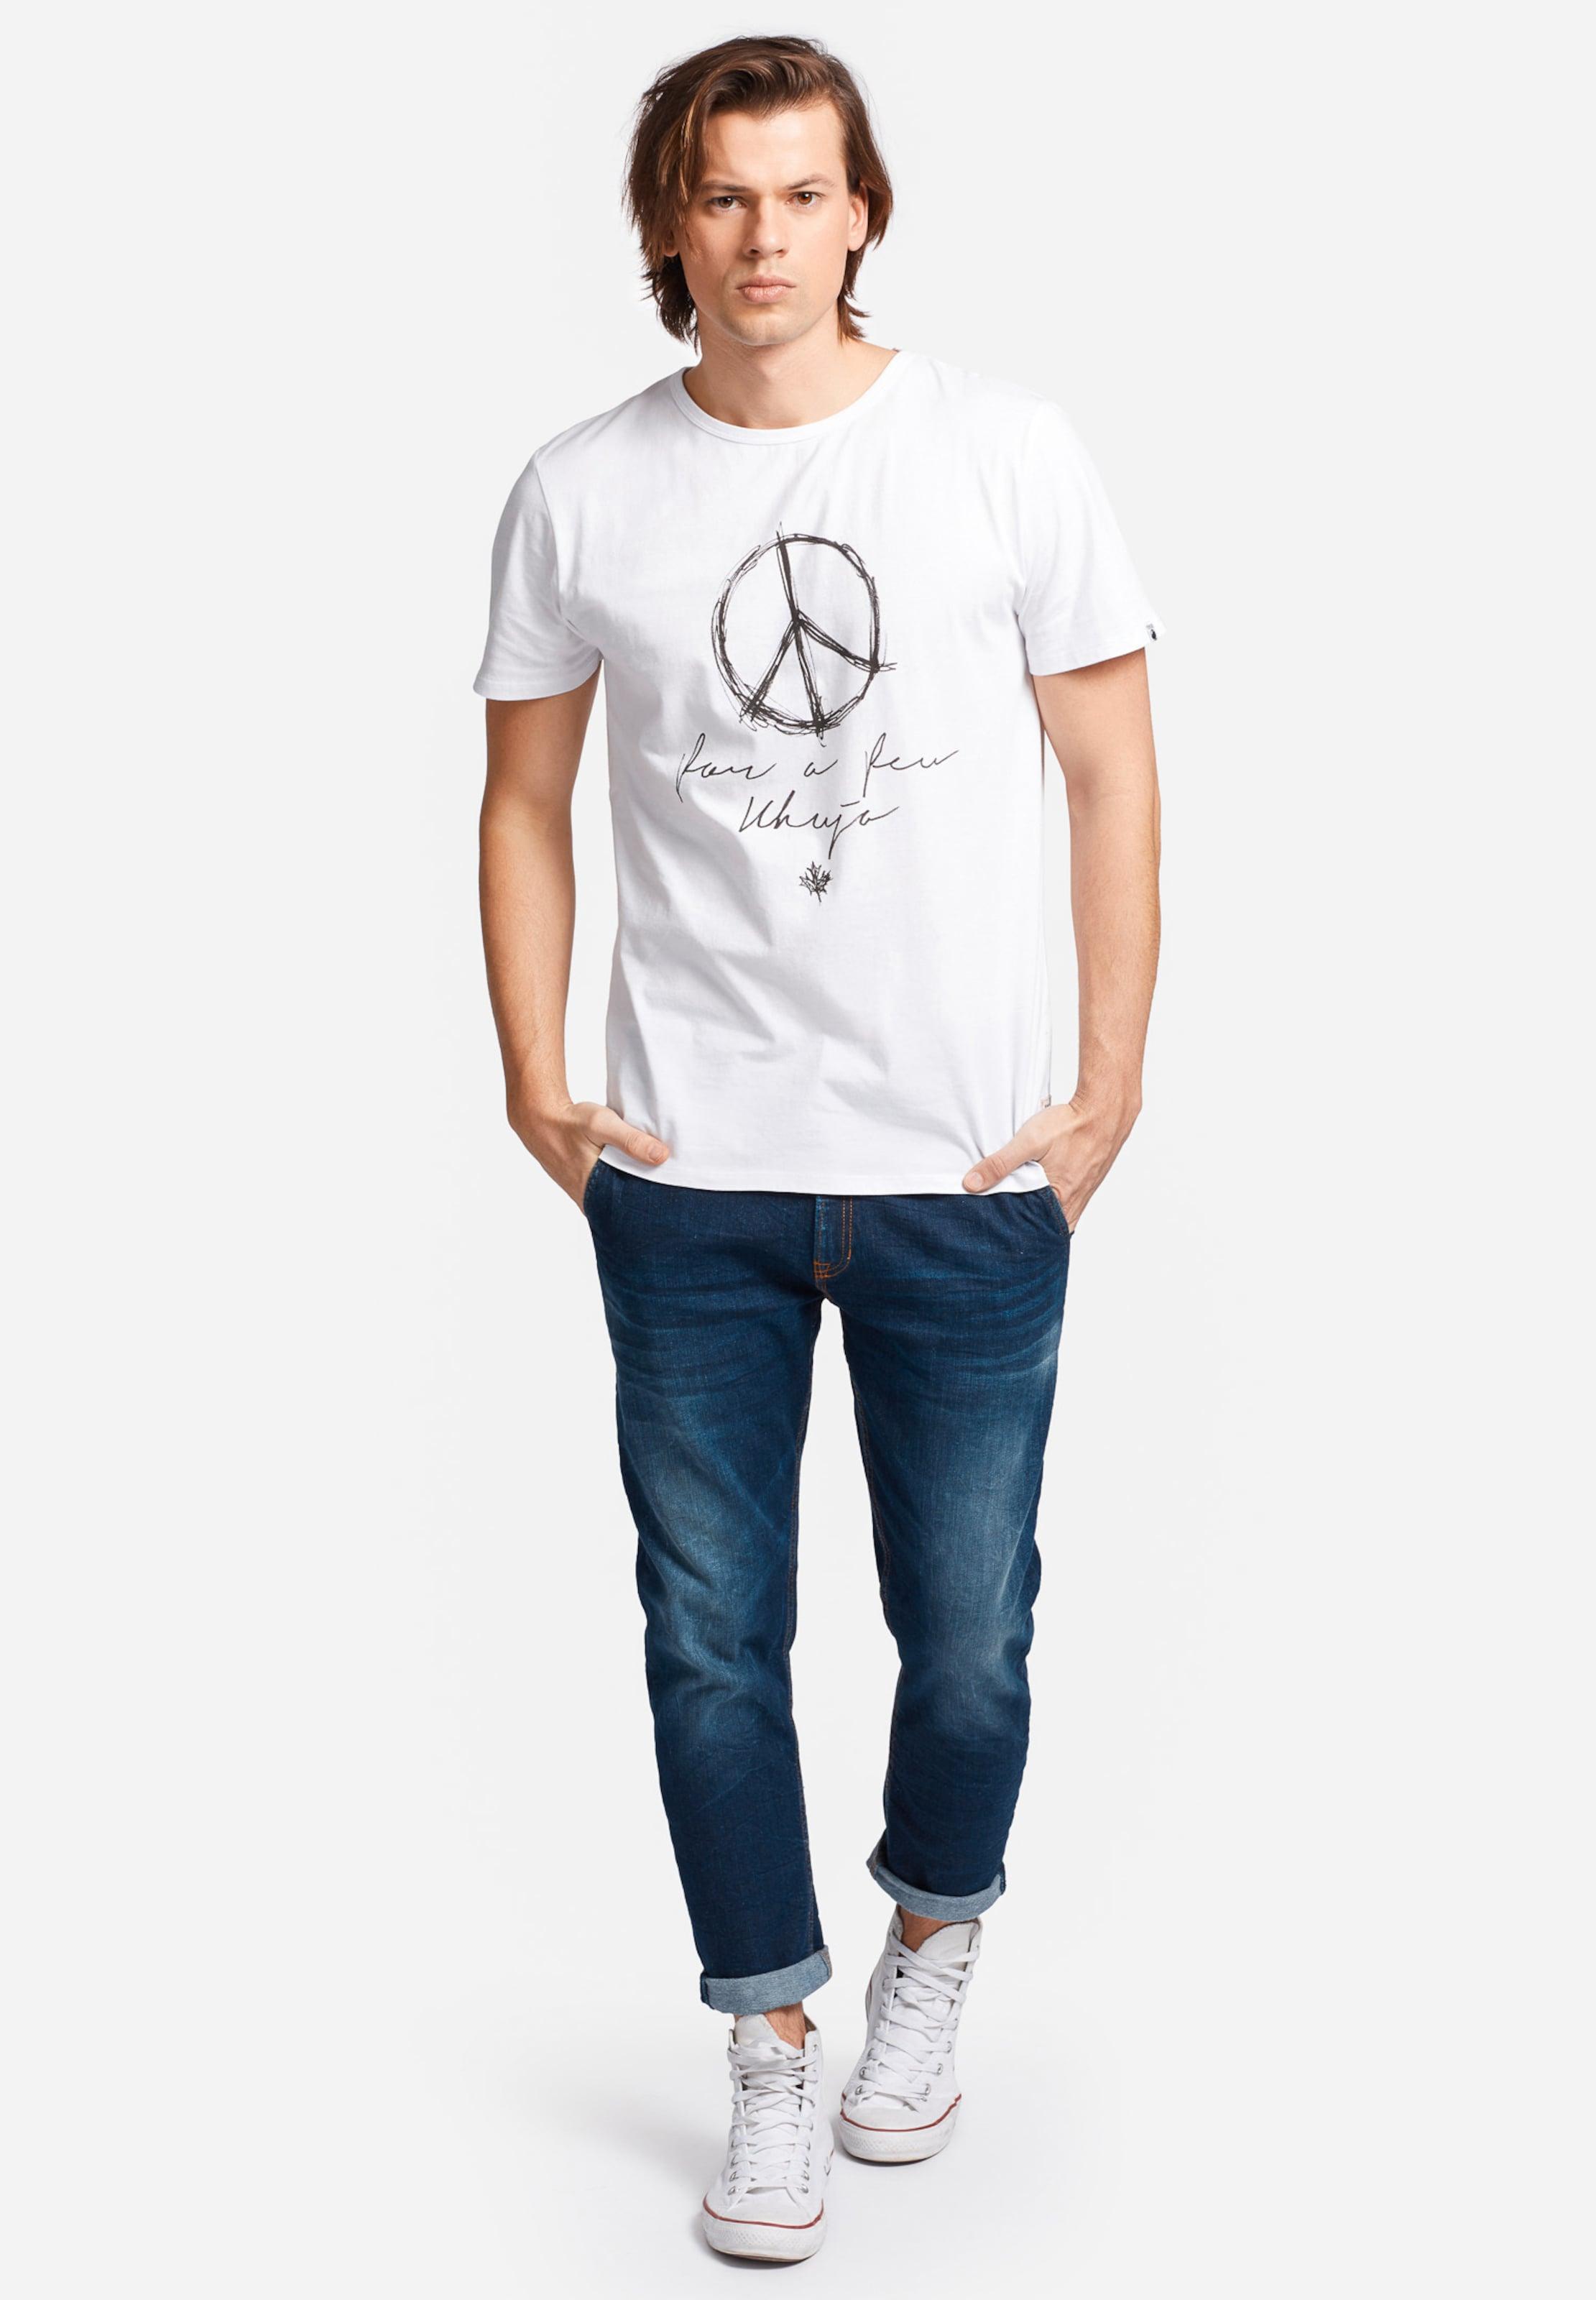 shirt Offwhite T 'alfons Khujo Scrible' In 8nN0mw